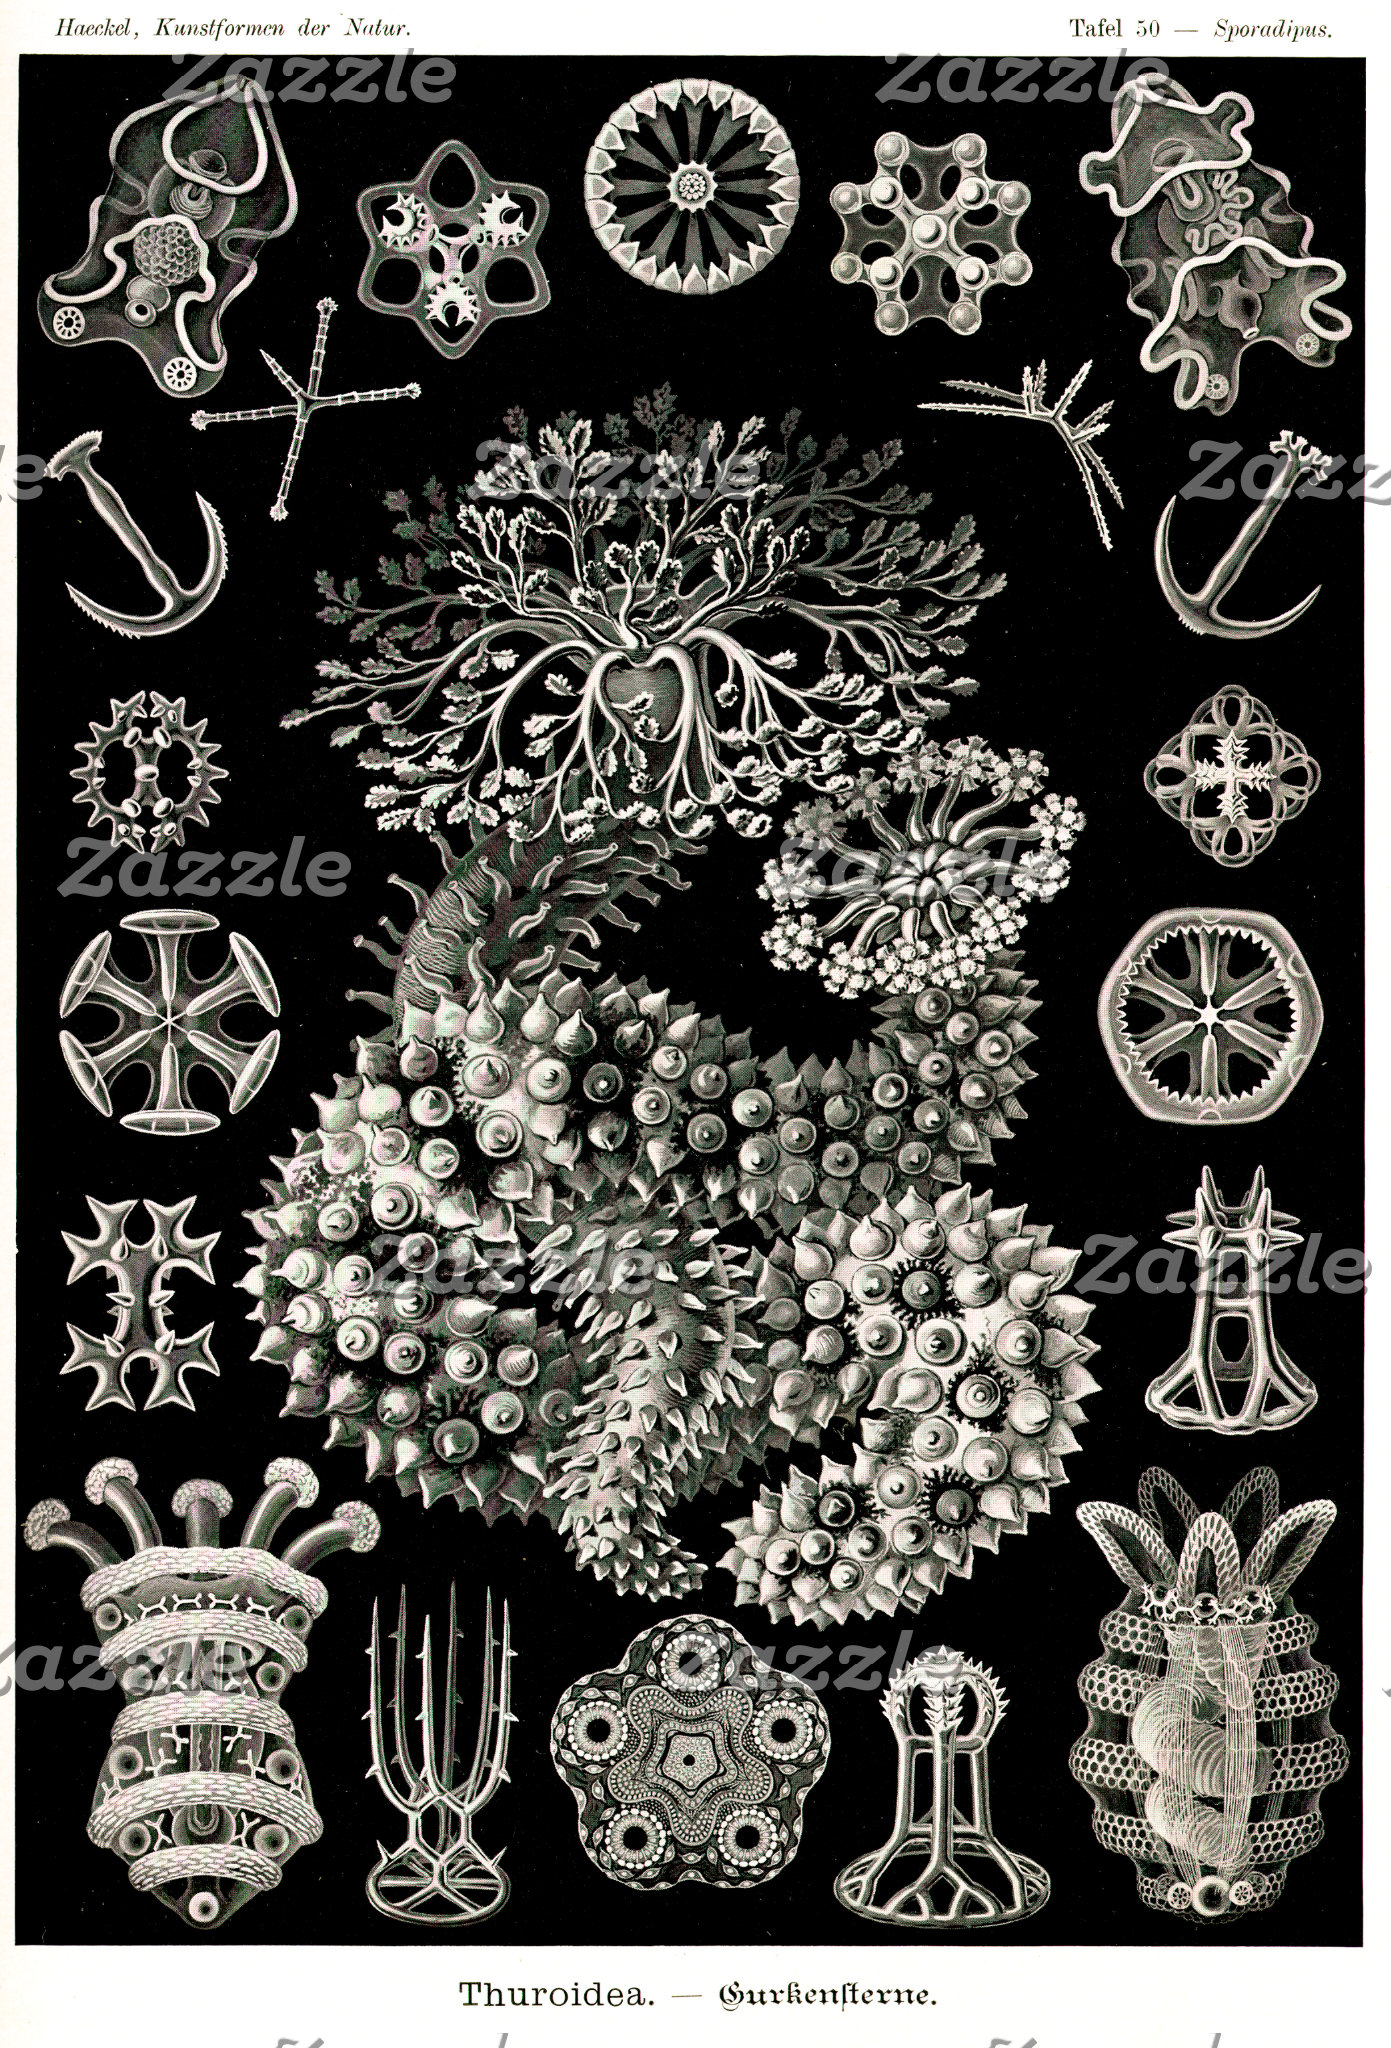 Ernst Haeckel Thuroidea Sea Cucumbers